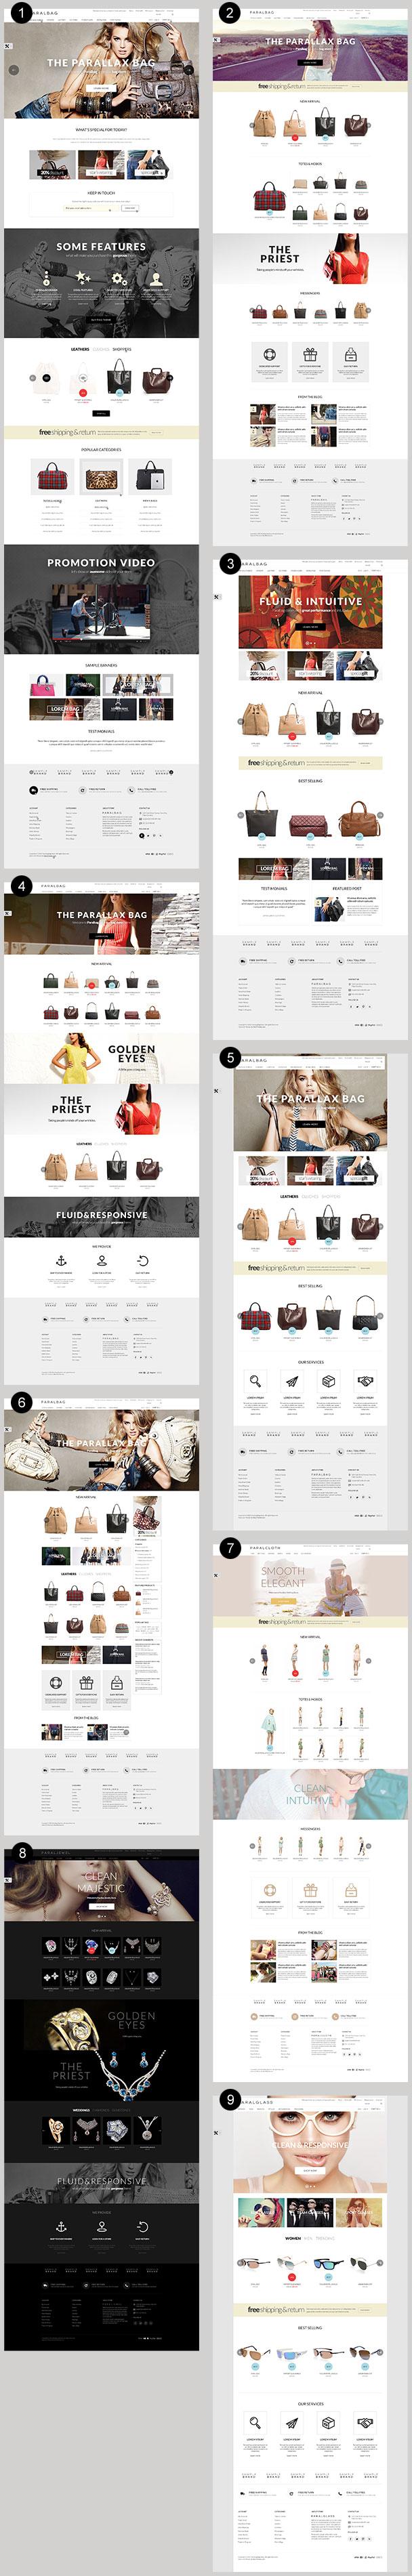 HomePage opencart fashion bag store - homepage - Opencart Fashion Bag Store — Parallax